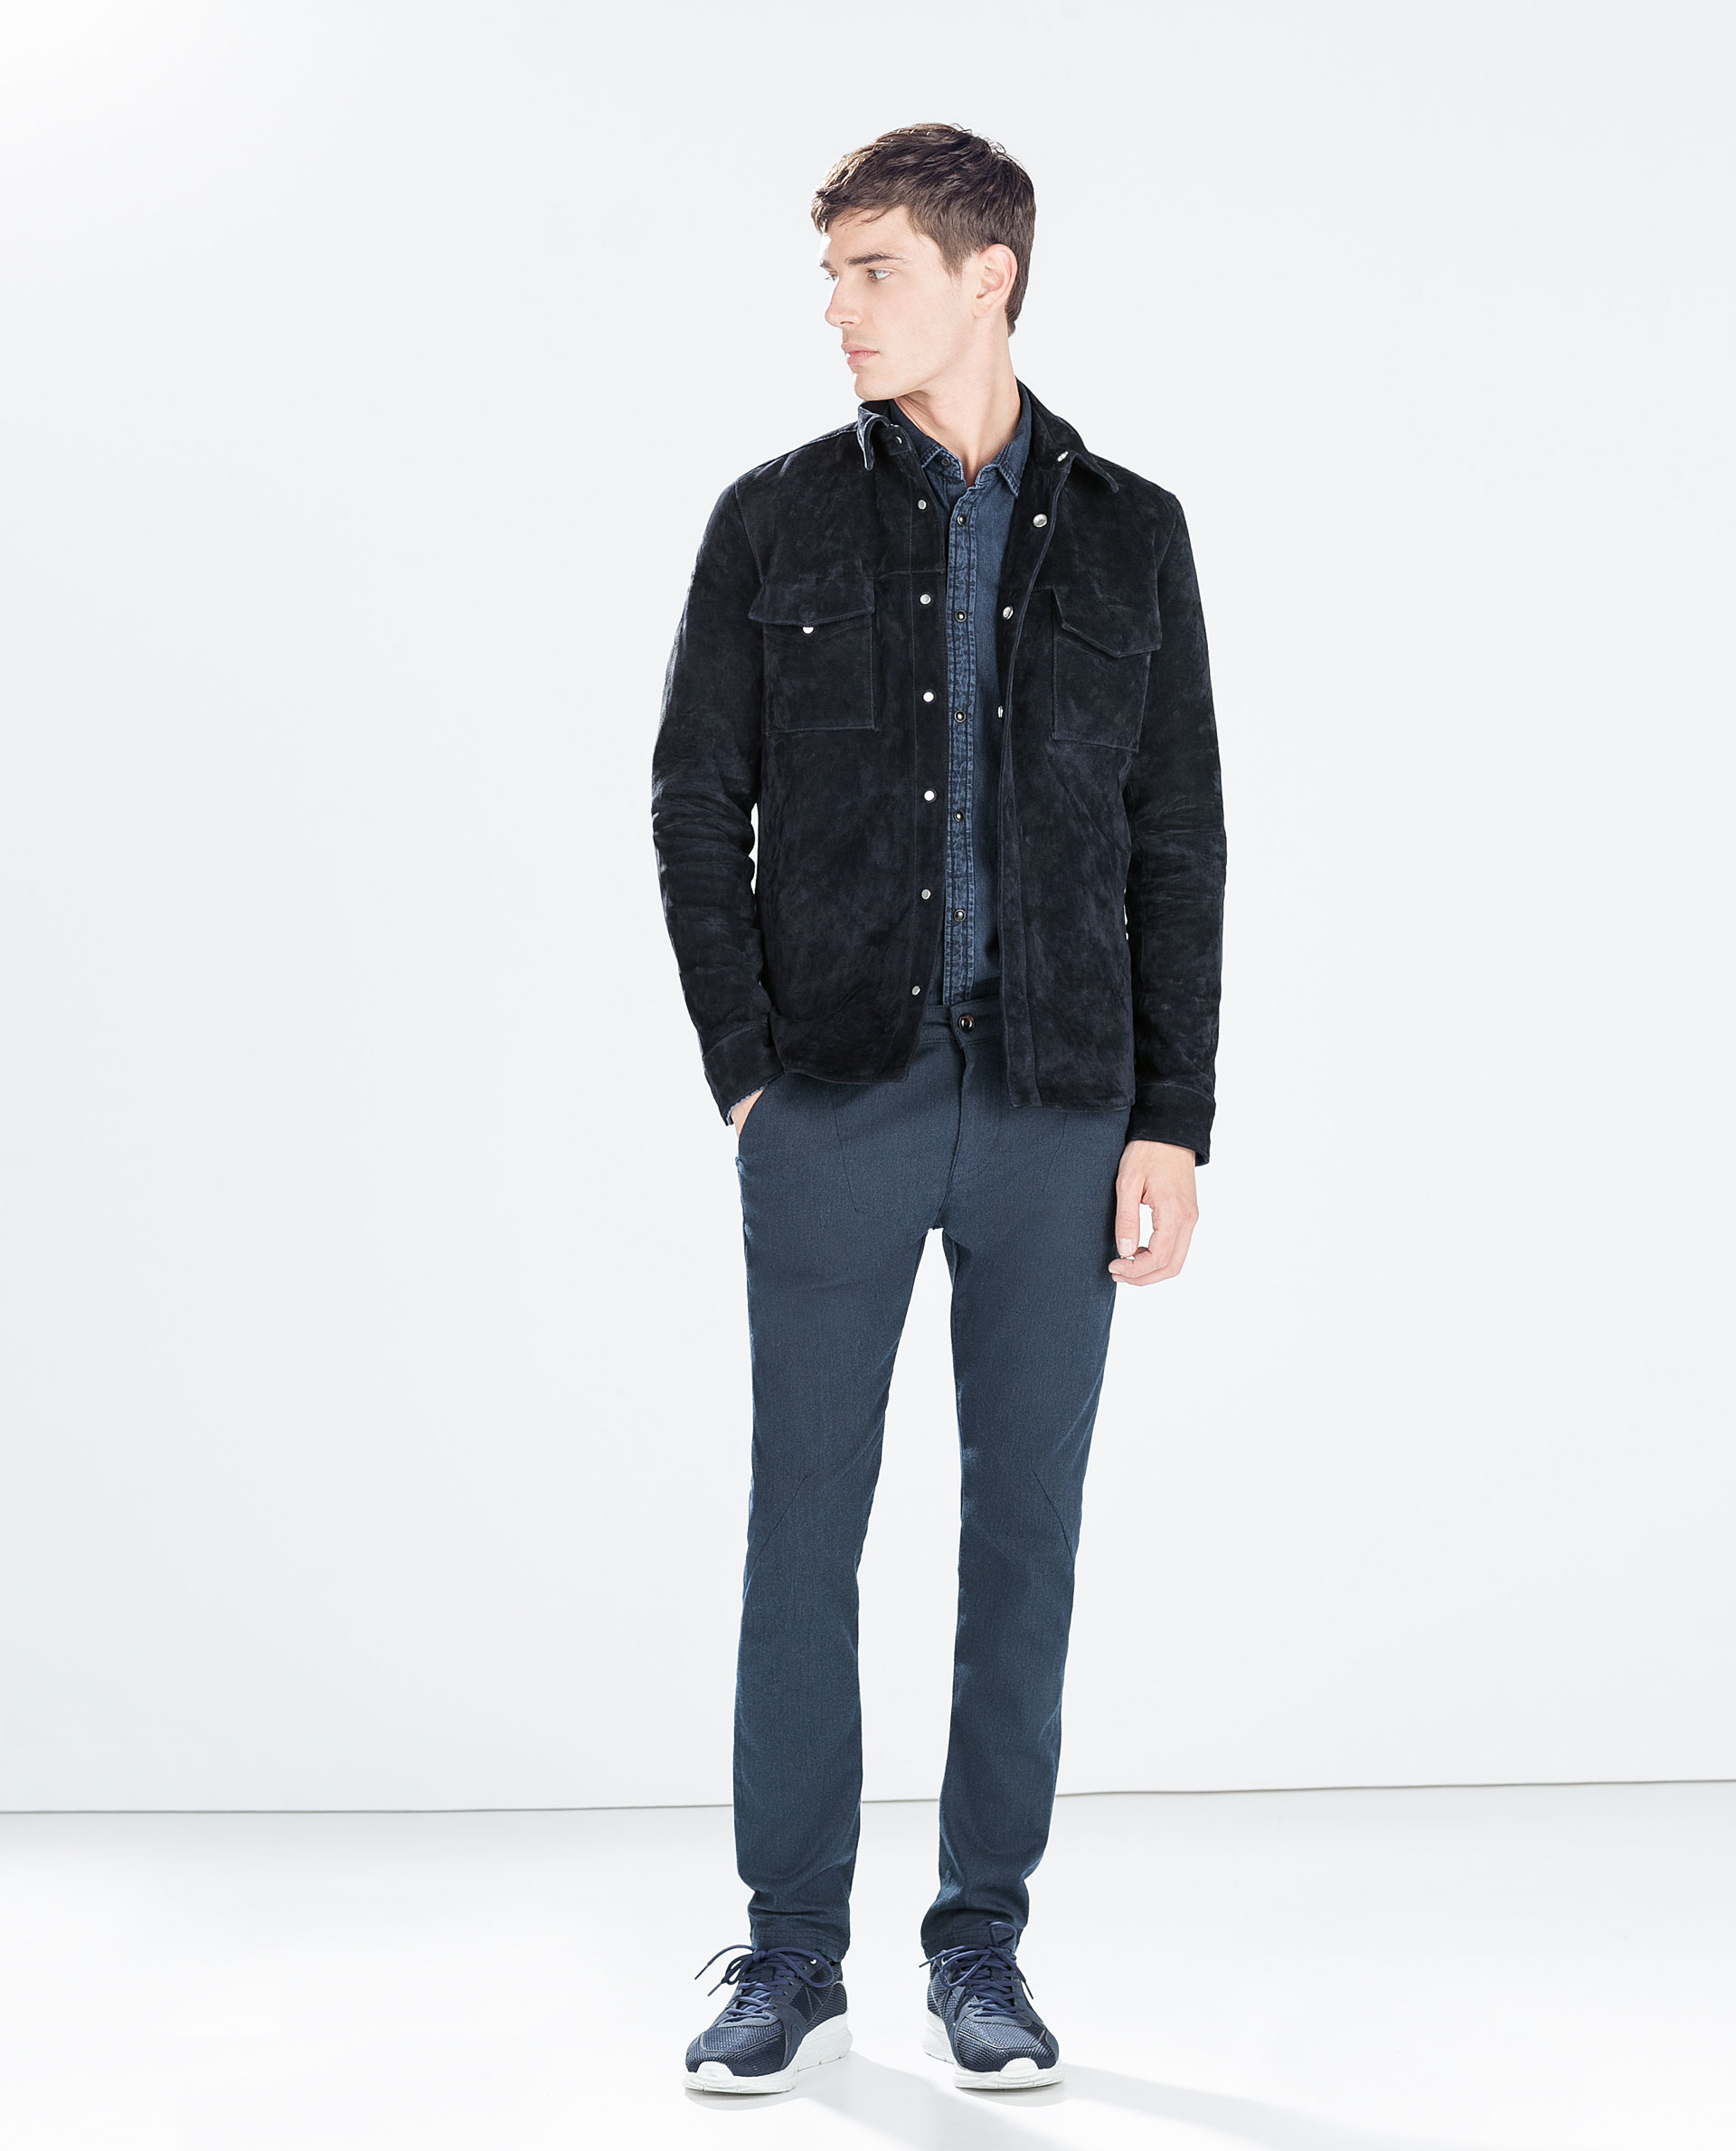 Zara Suede Overshirt In Blue For Men Lyst